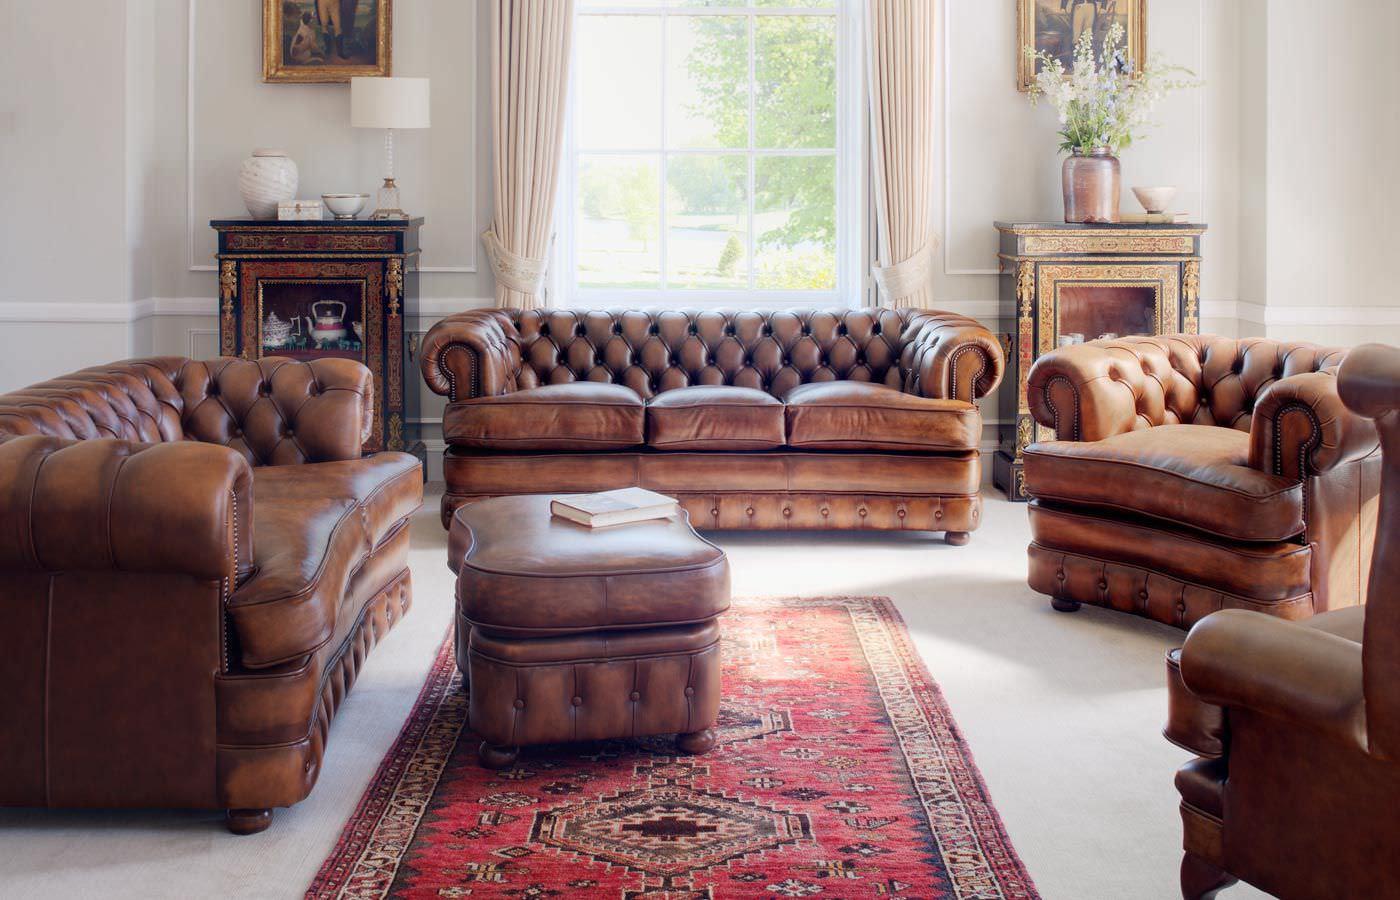 chesterfield sofa set home furniture design. Black Bedroom Furniture Sets. Home Design Ideas